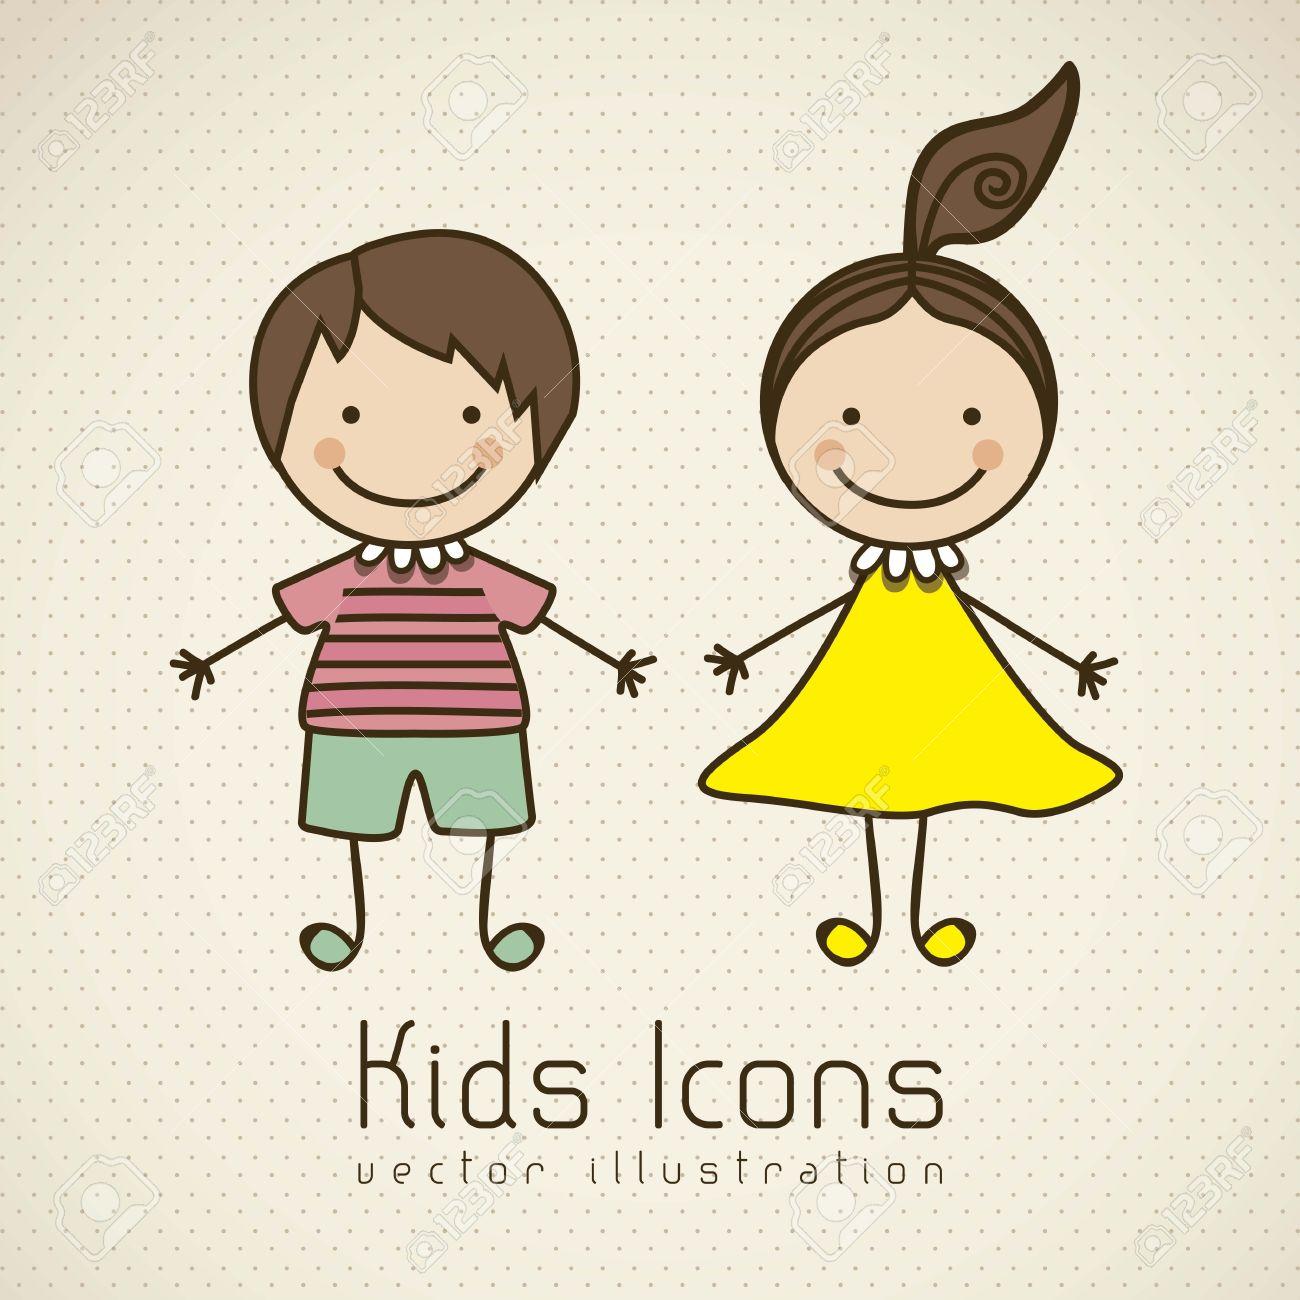 Illustration of kids icons, kids groups, vector illustration Stock Vector - 16819281